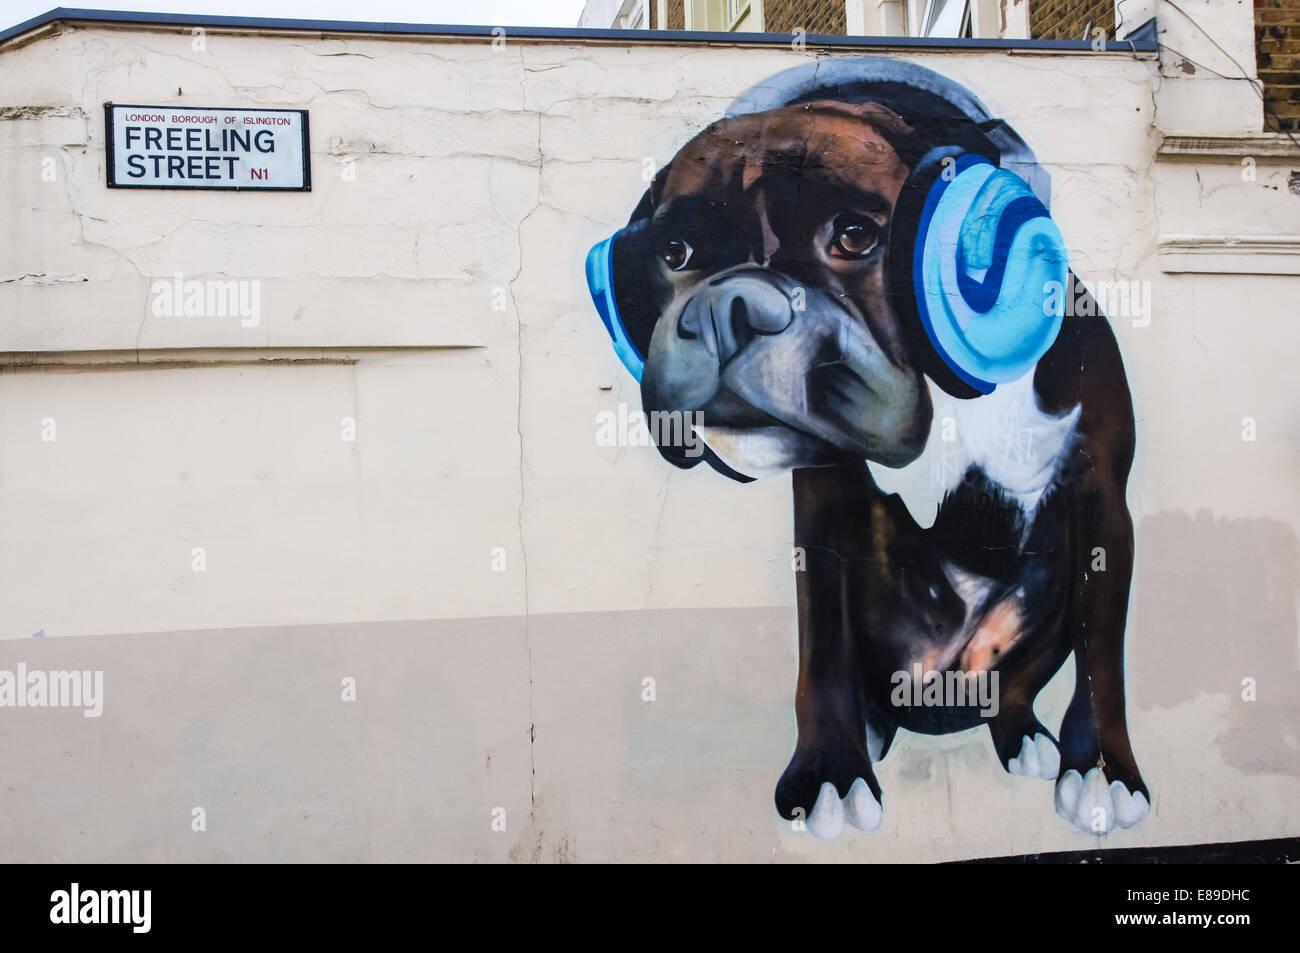 Graffiti on RSPCA shop on Caledonian Road  London England United Kingdom UK - Stock Image